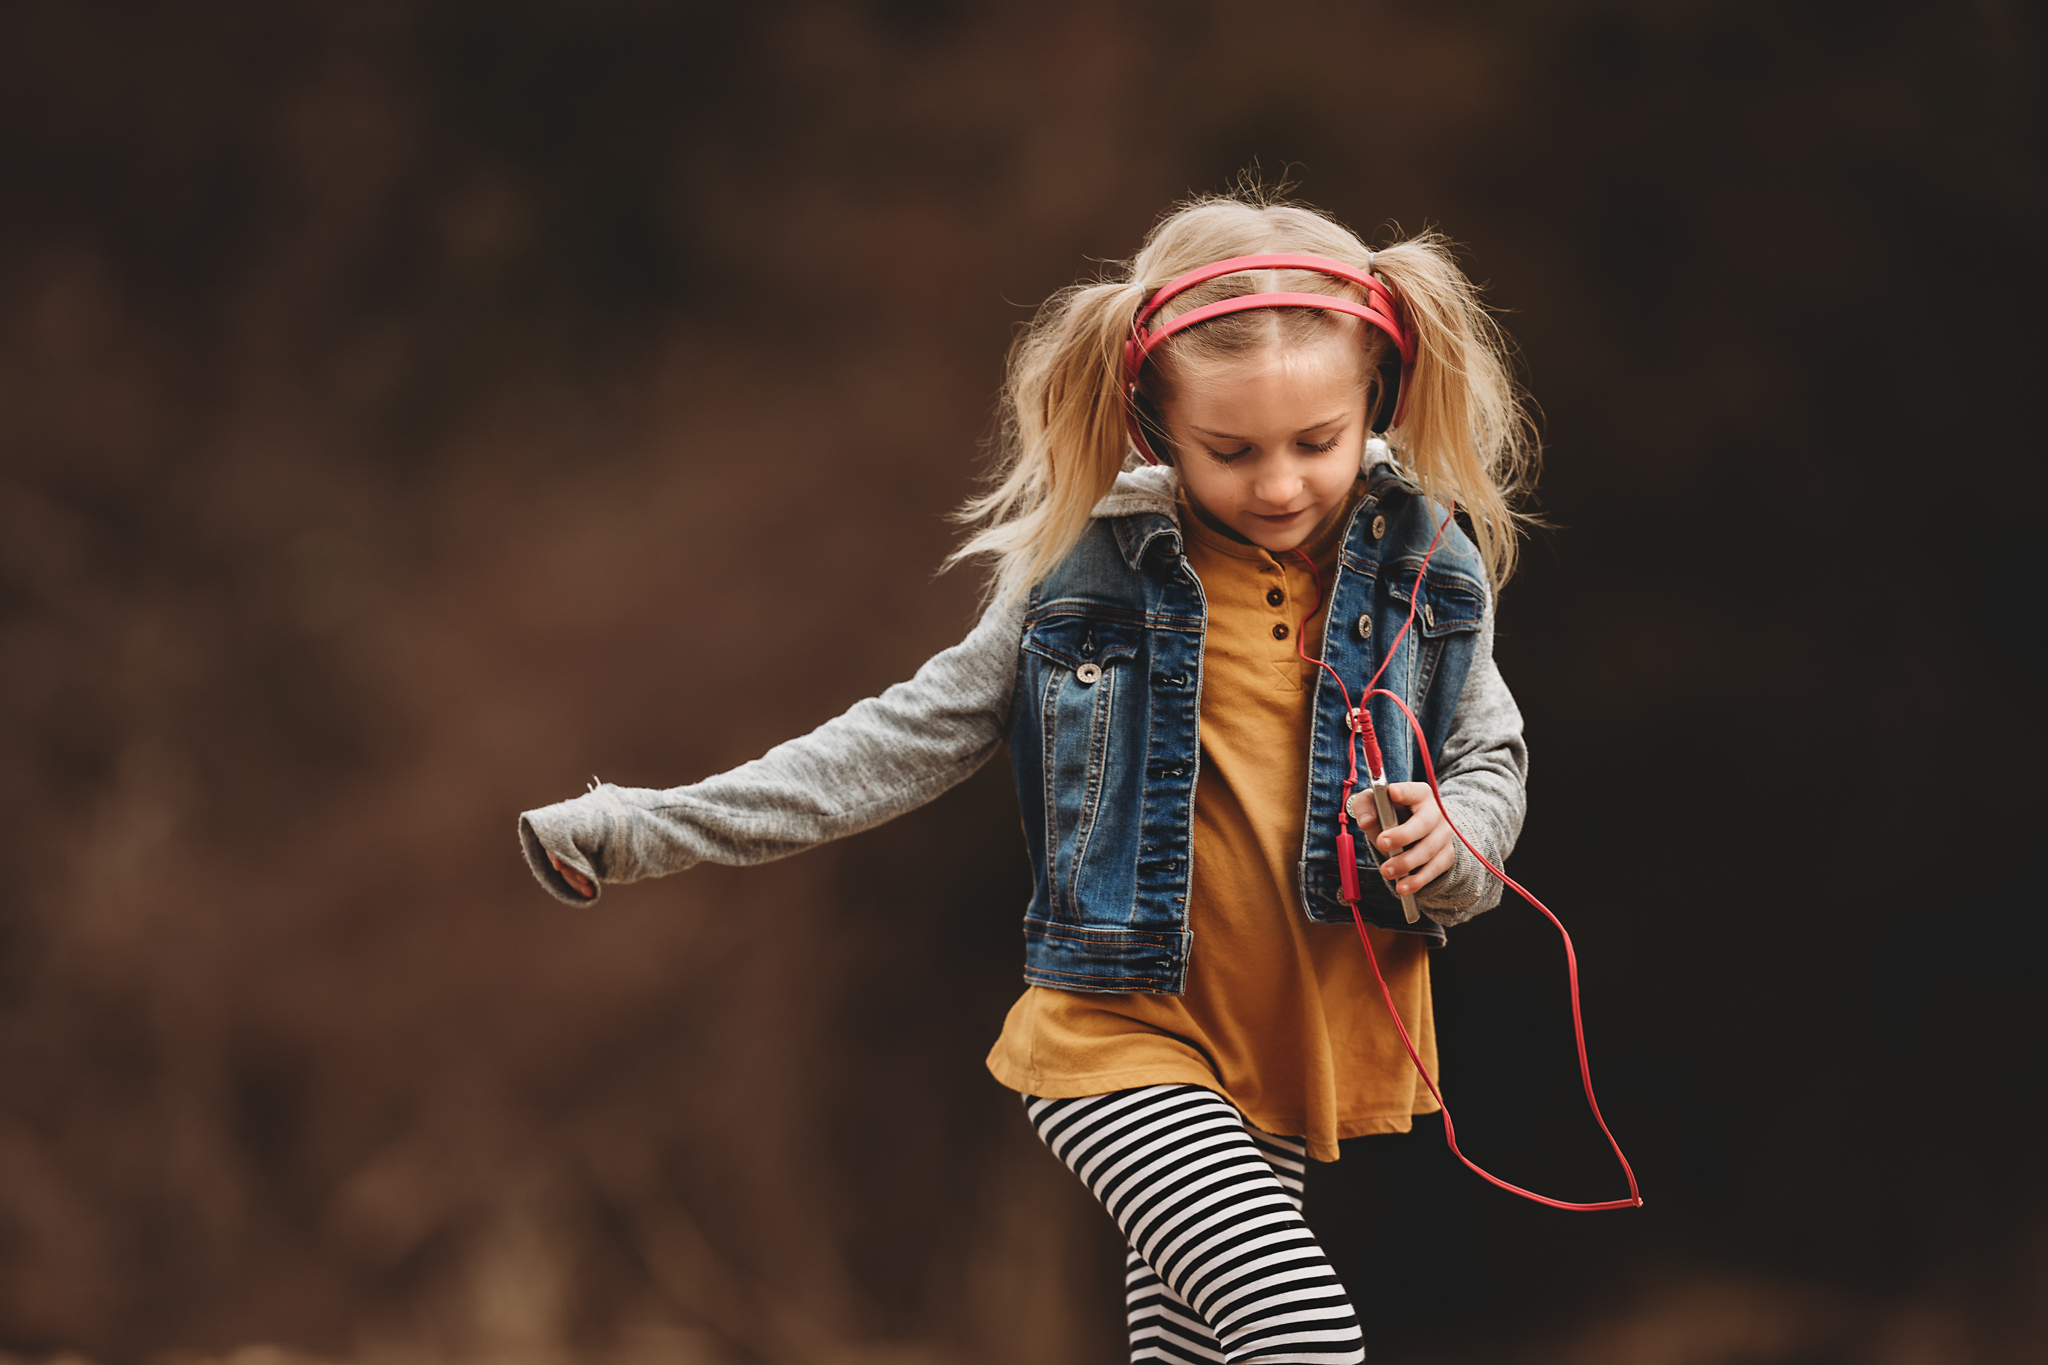 Long-island-photographer-hello-olivia-photography-children-kids-photos-new-york-lifestyle-portraits-suffolk-County-LI-36.jpg